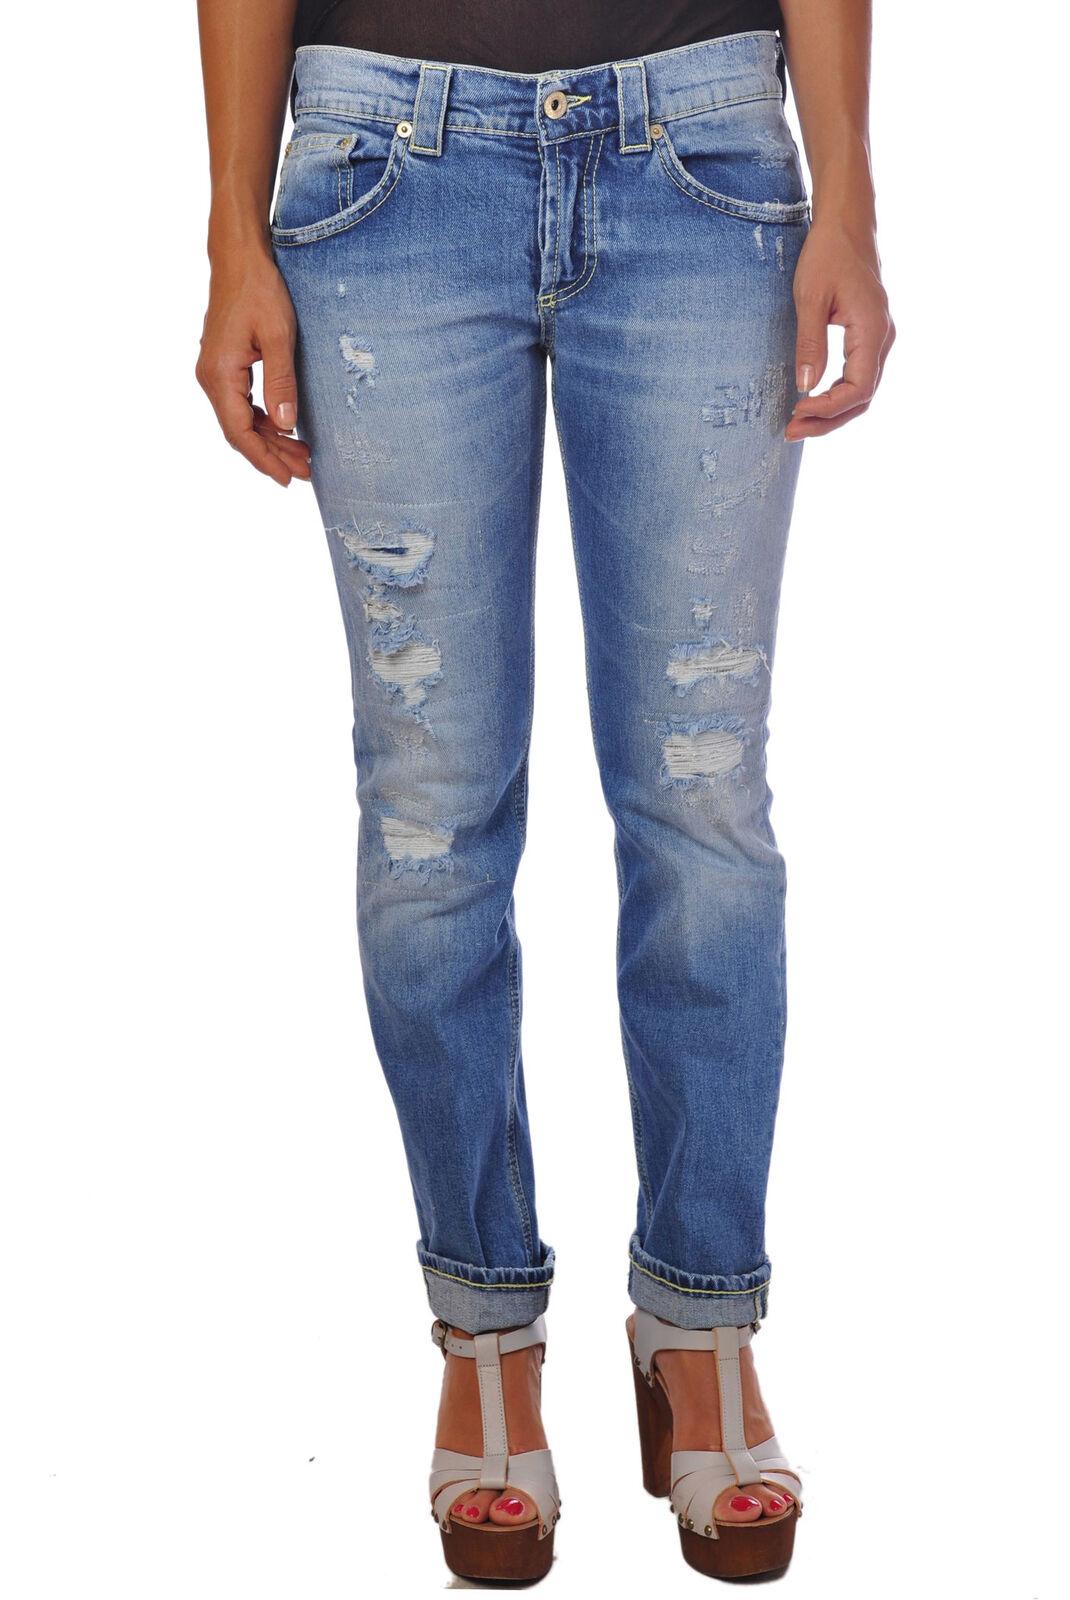 Dondup - Jeans-straight leg Pants - Woman - Denim - 375215C183616